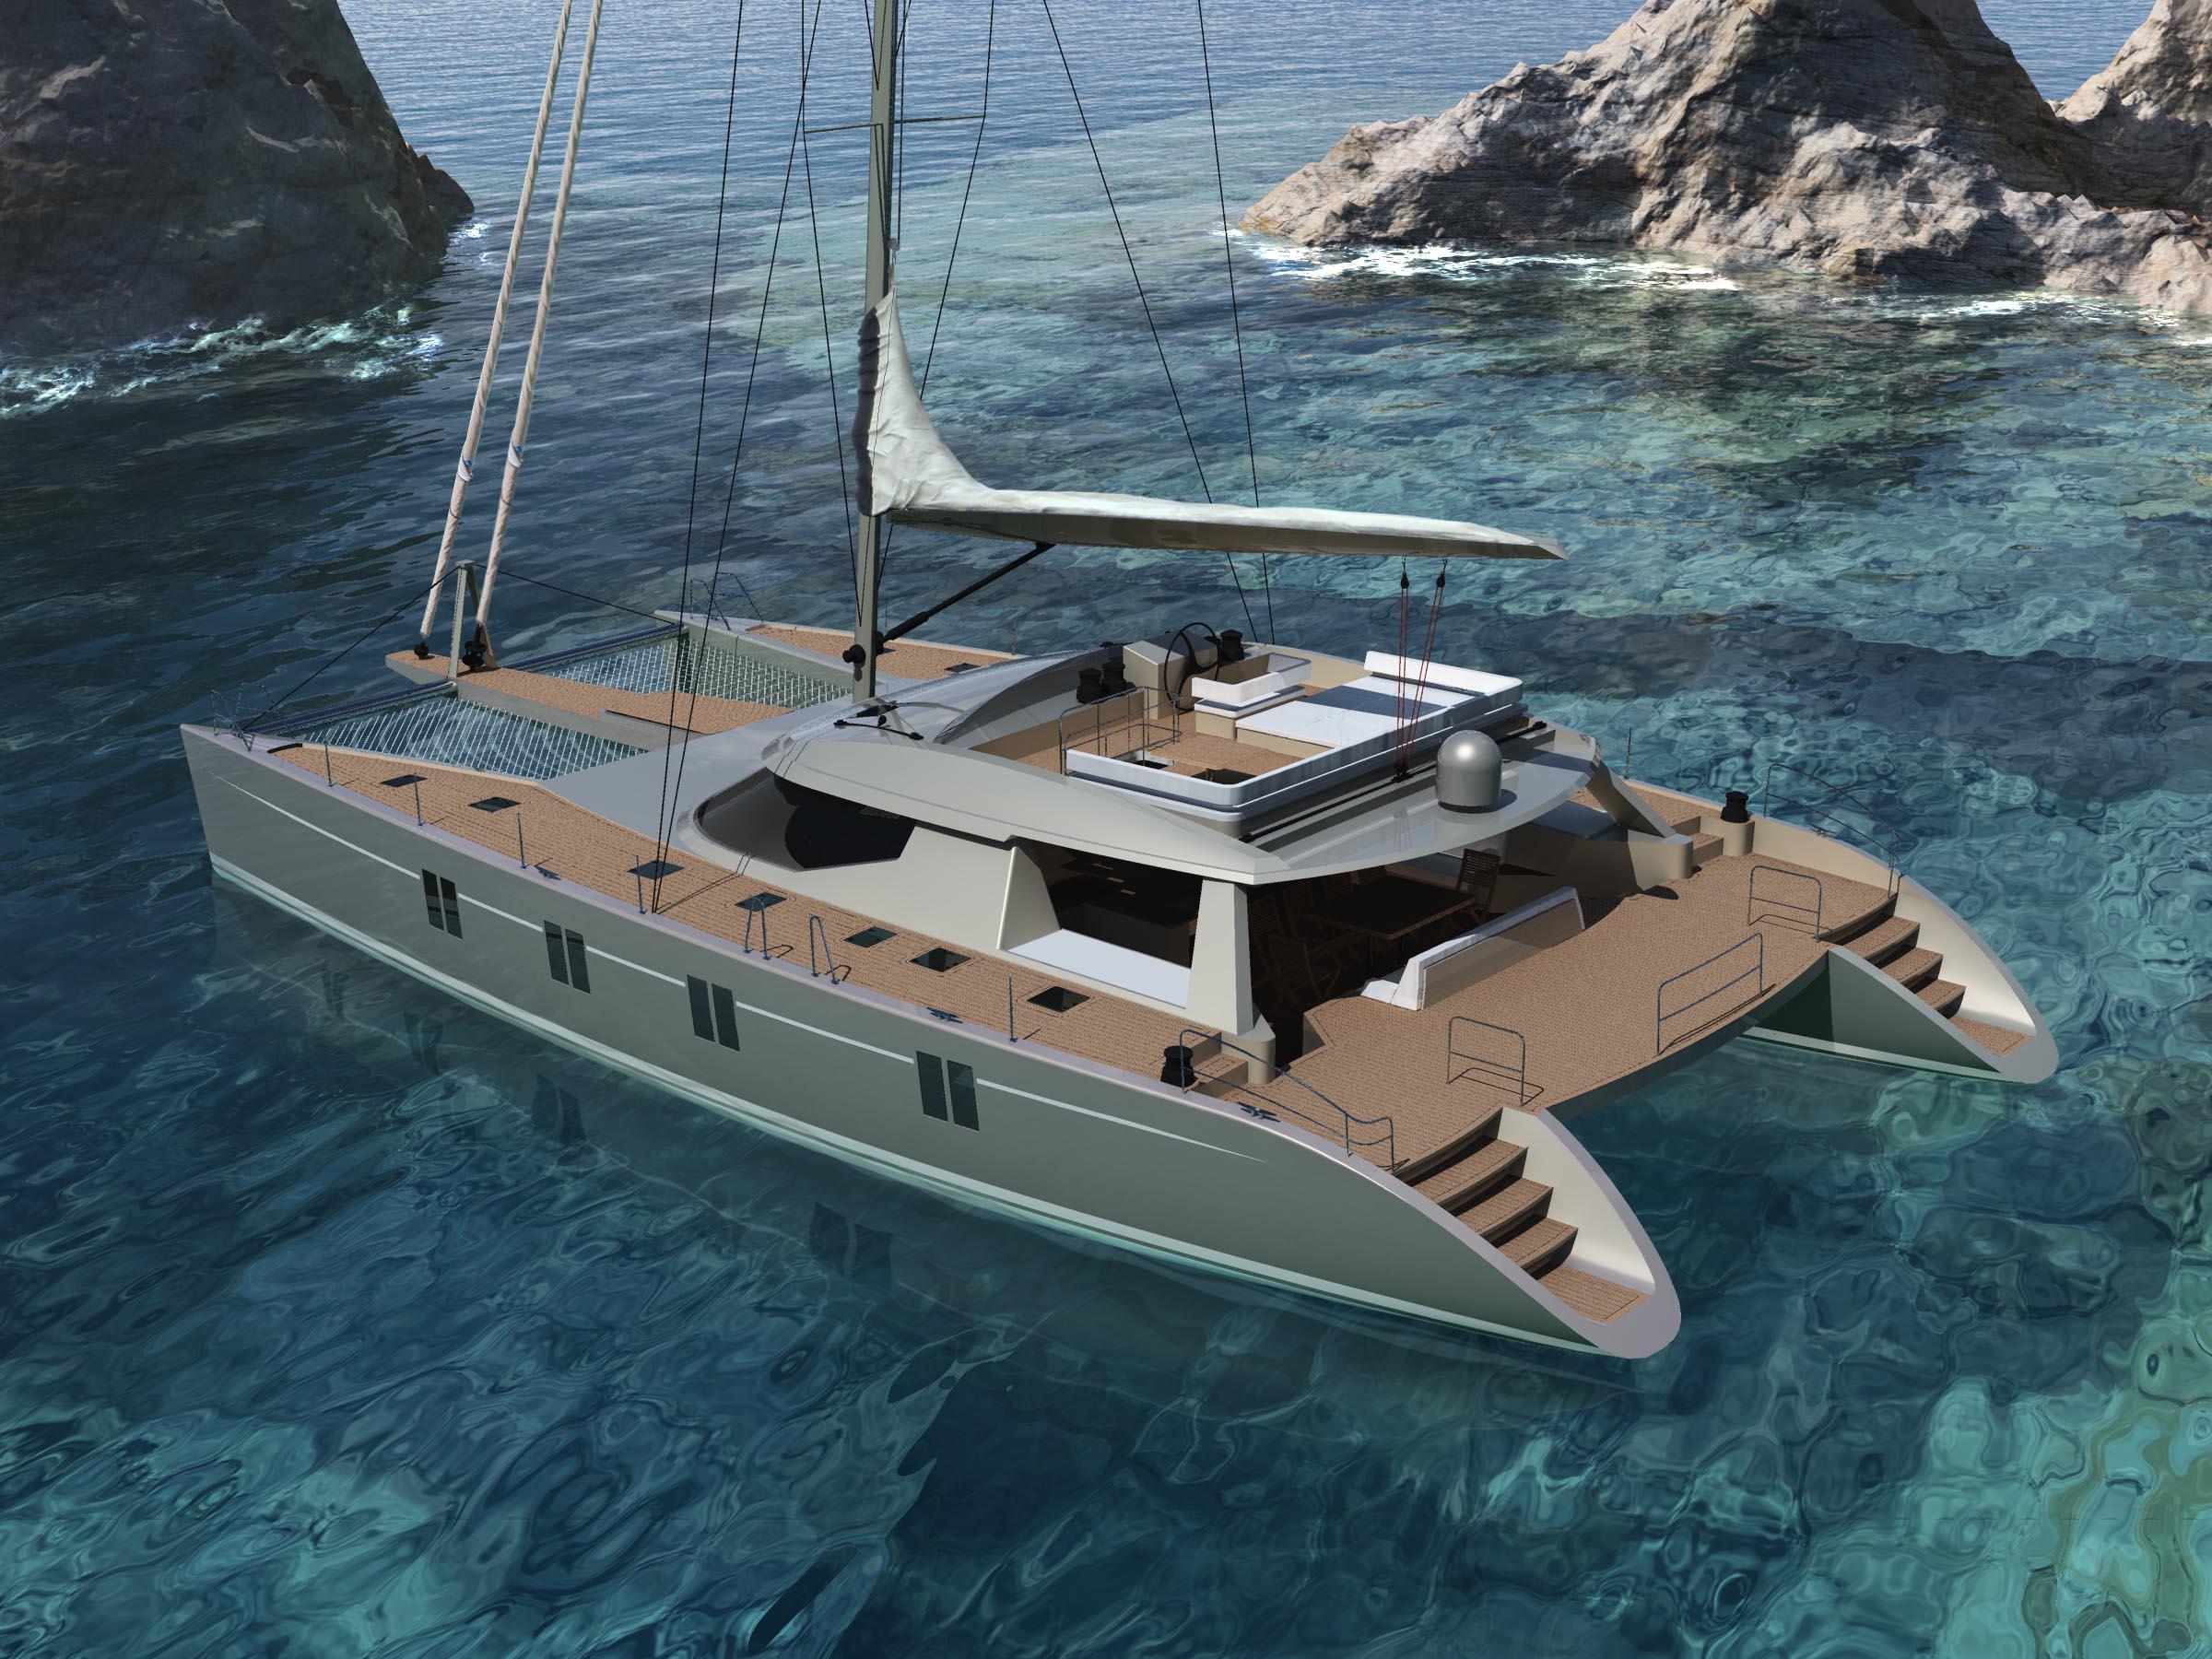 Sailing Catamaran Havana 72 Designed By Berret Racoupeau